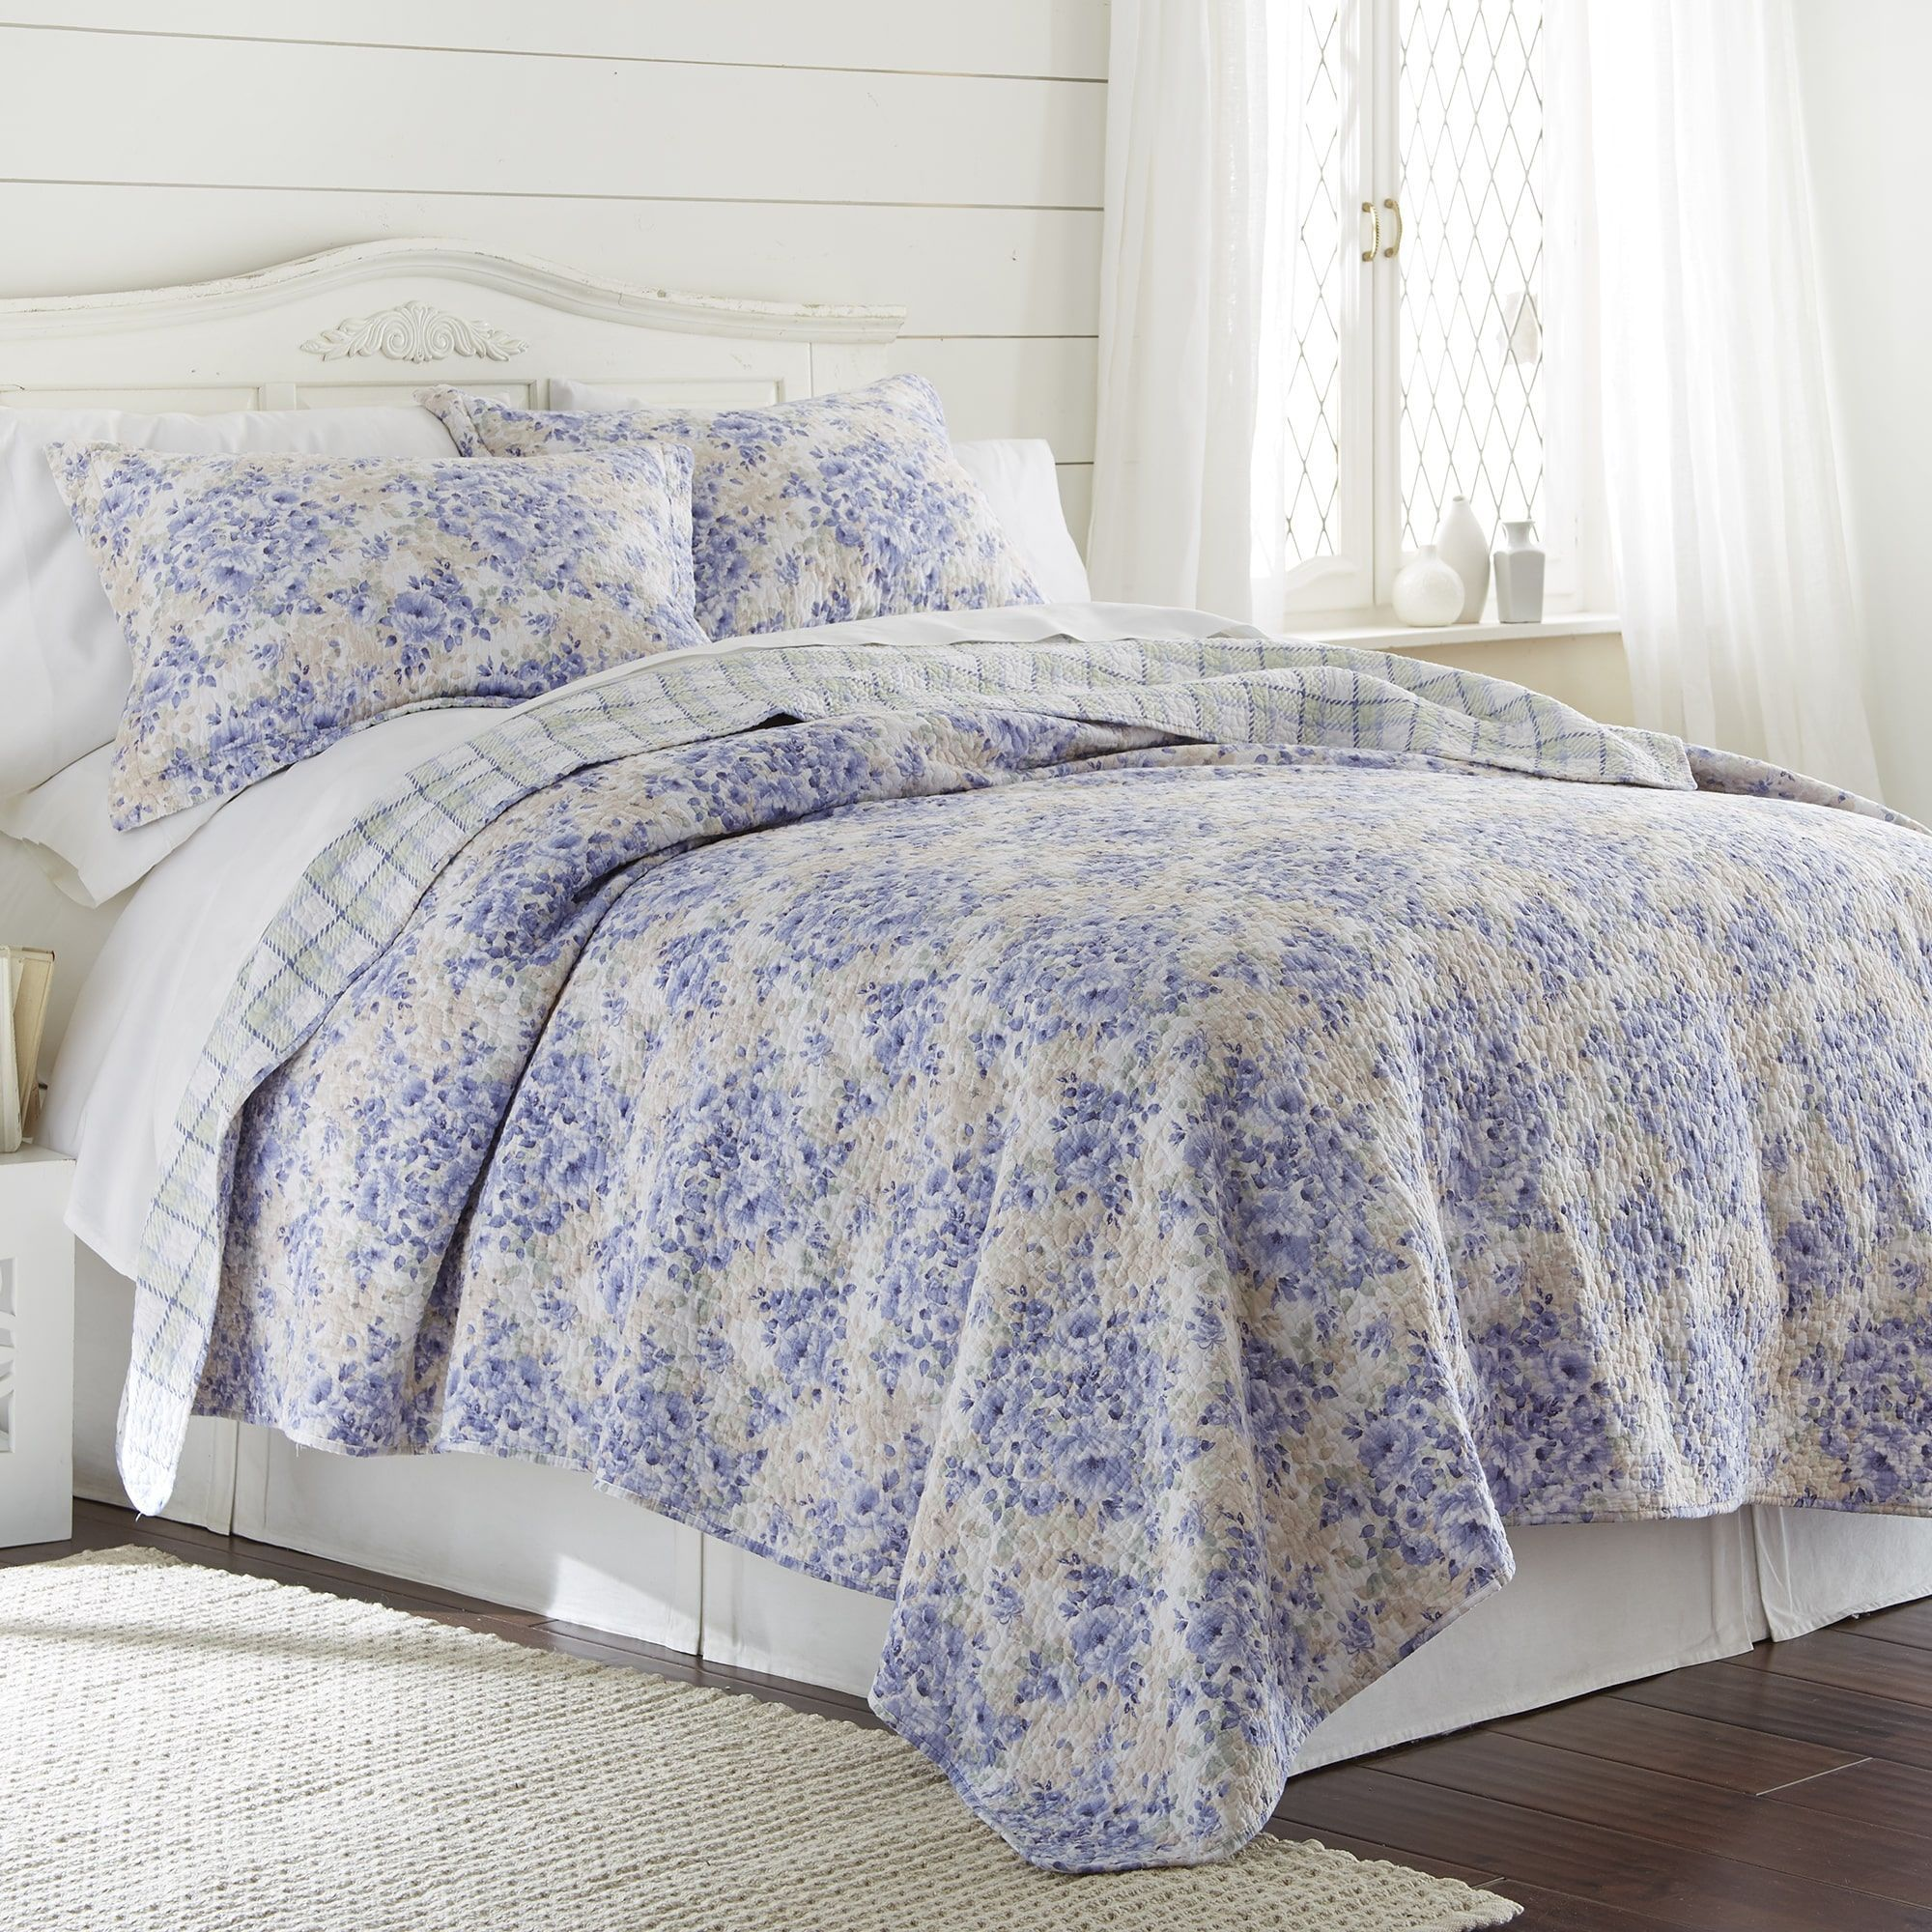 Floral Toile Patchwork Blue Super King Cotton Blend Reversible Duvet Cover Set Kids Teens Home Items Teen Bedding